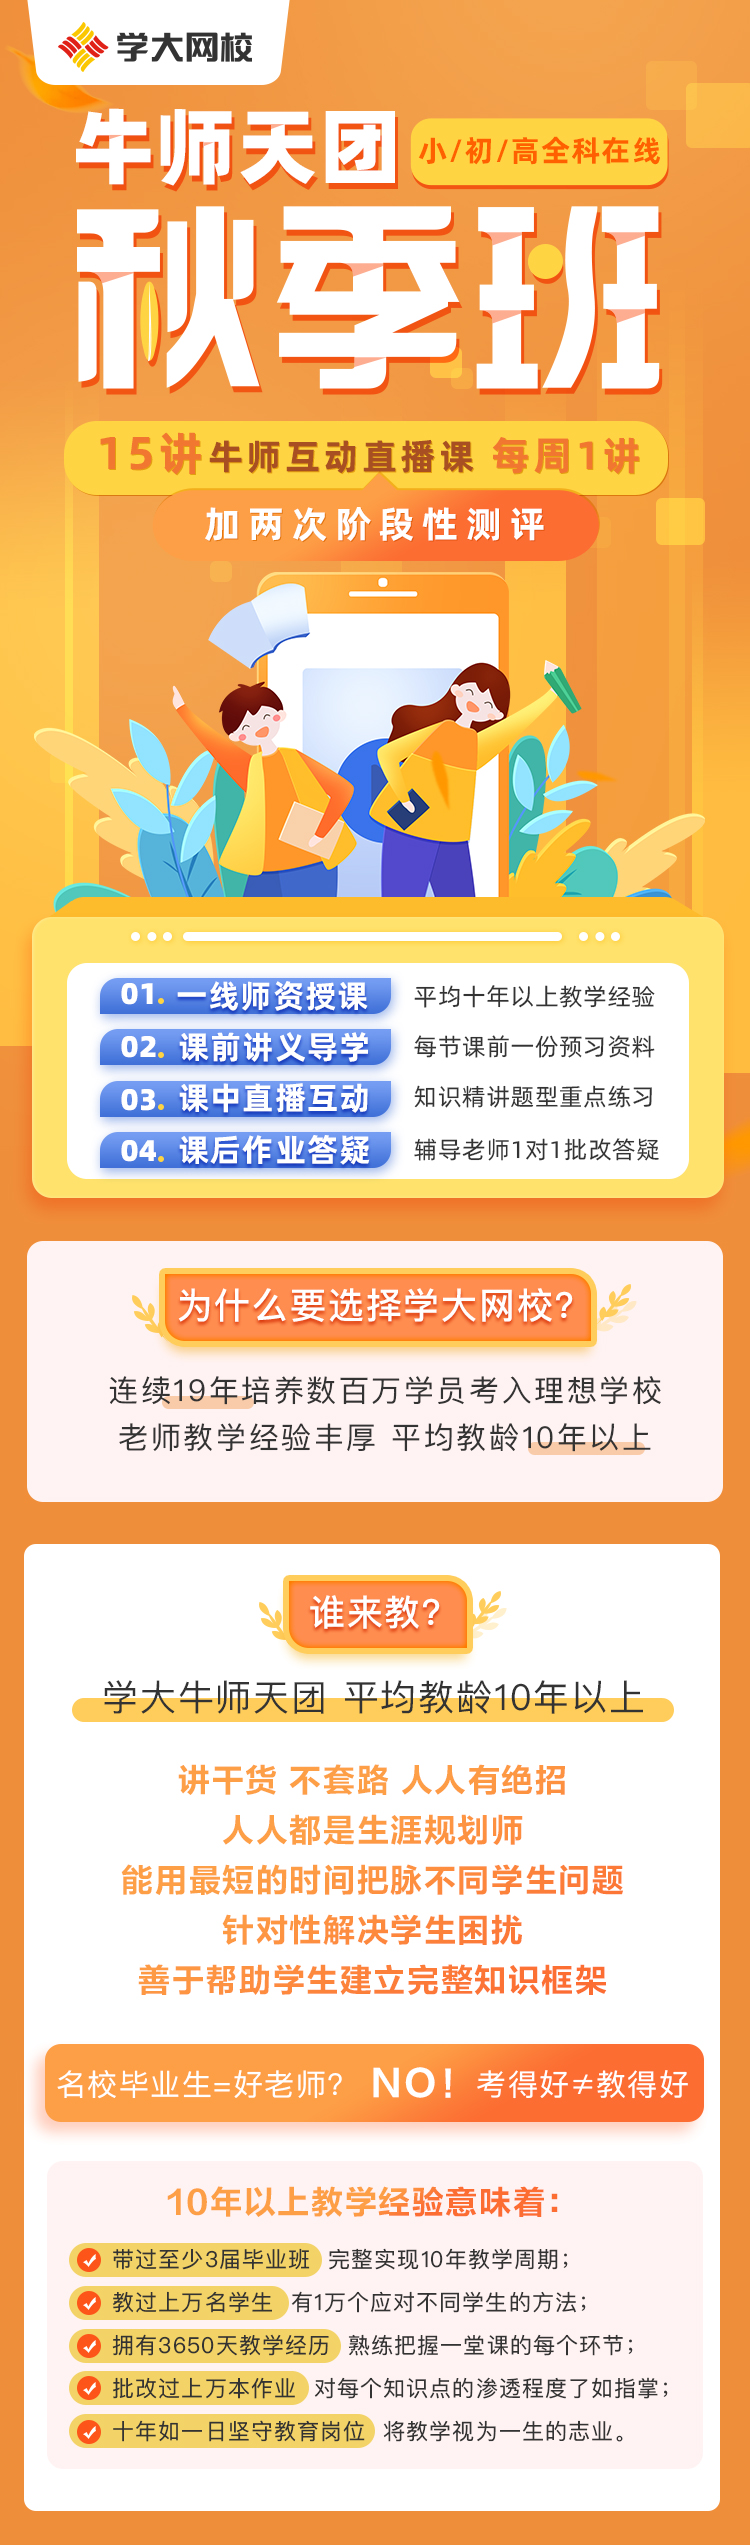 https://xdo-storage.oss-cn-beijing.aliyuncs.com/2020/08/07/JTfRINwLq76jaH43FXLlXRpPm6PwVksix7bCcmbG.jpeg